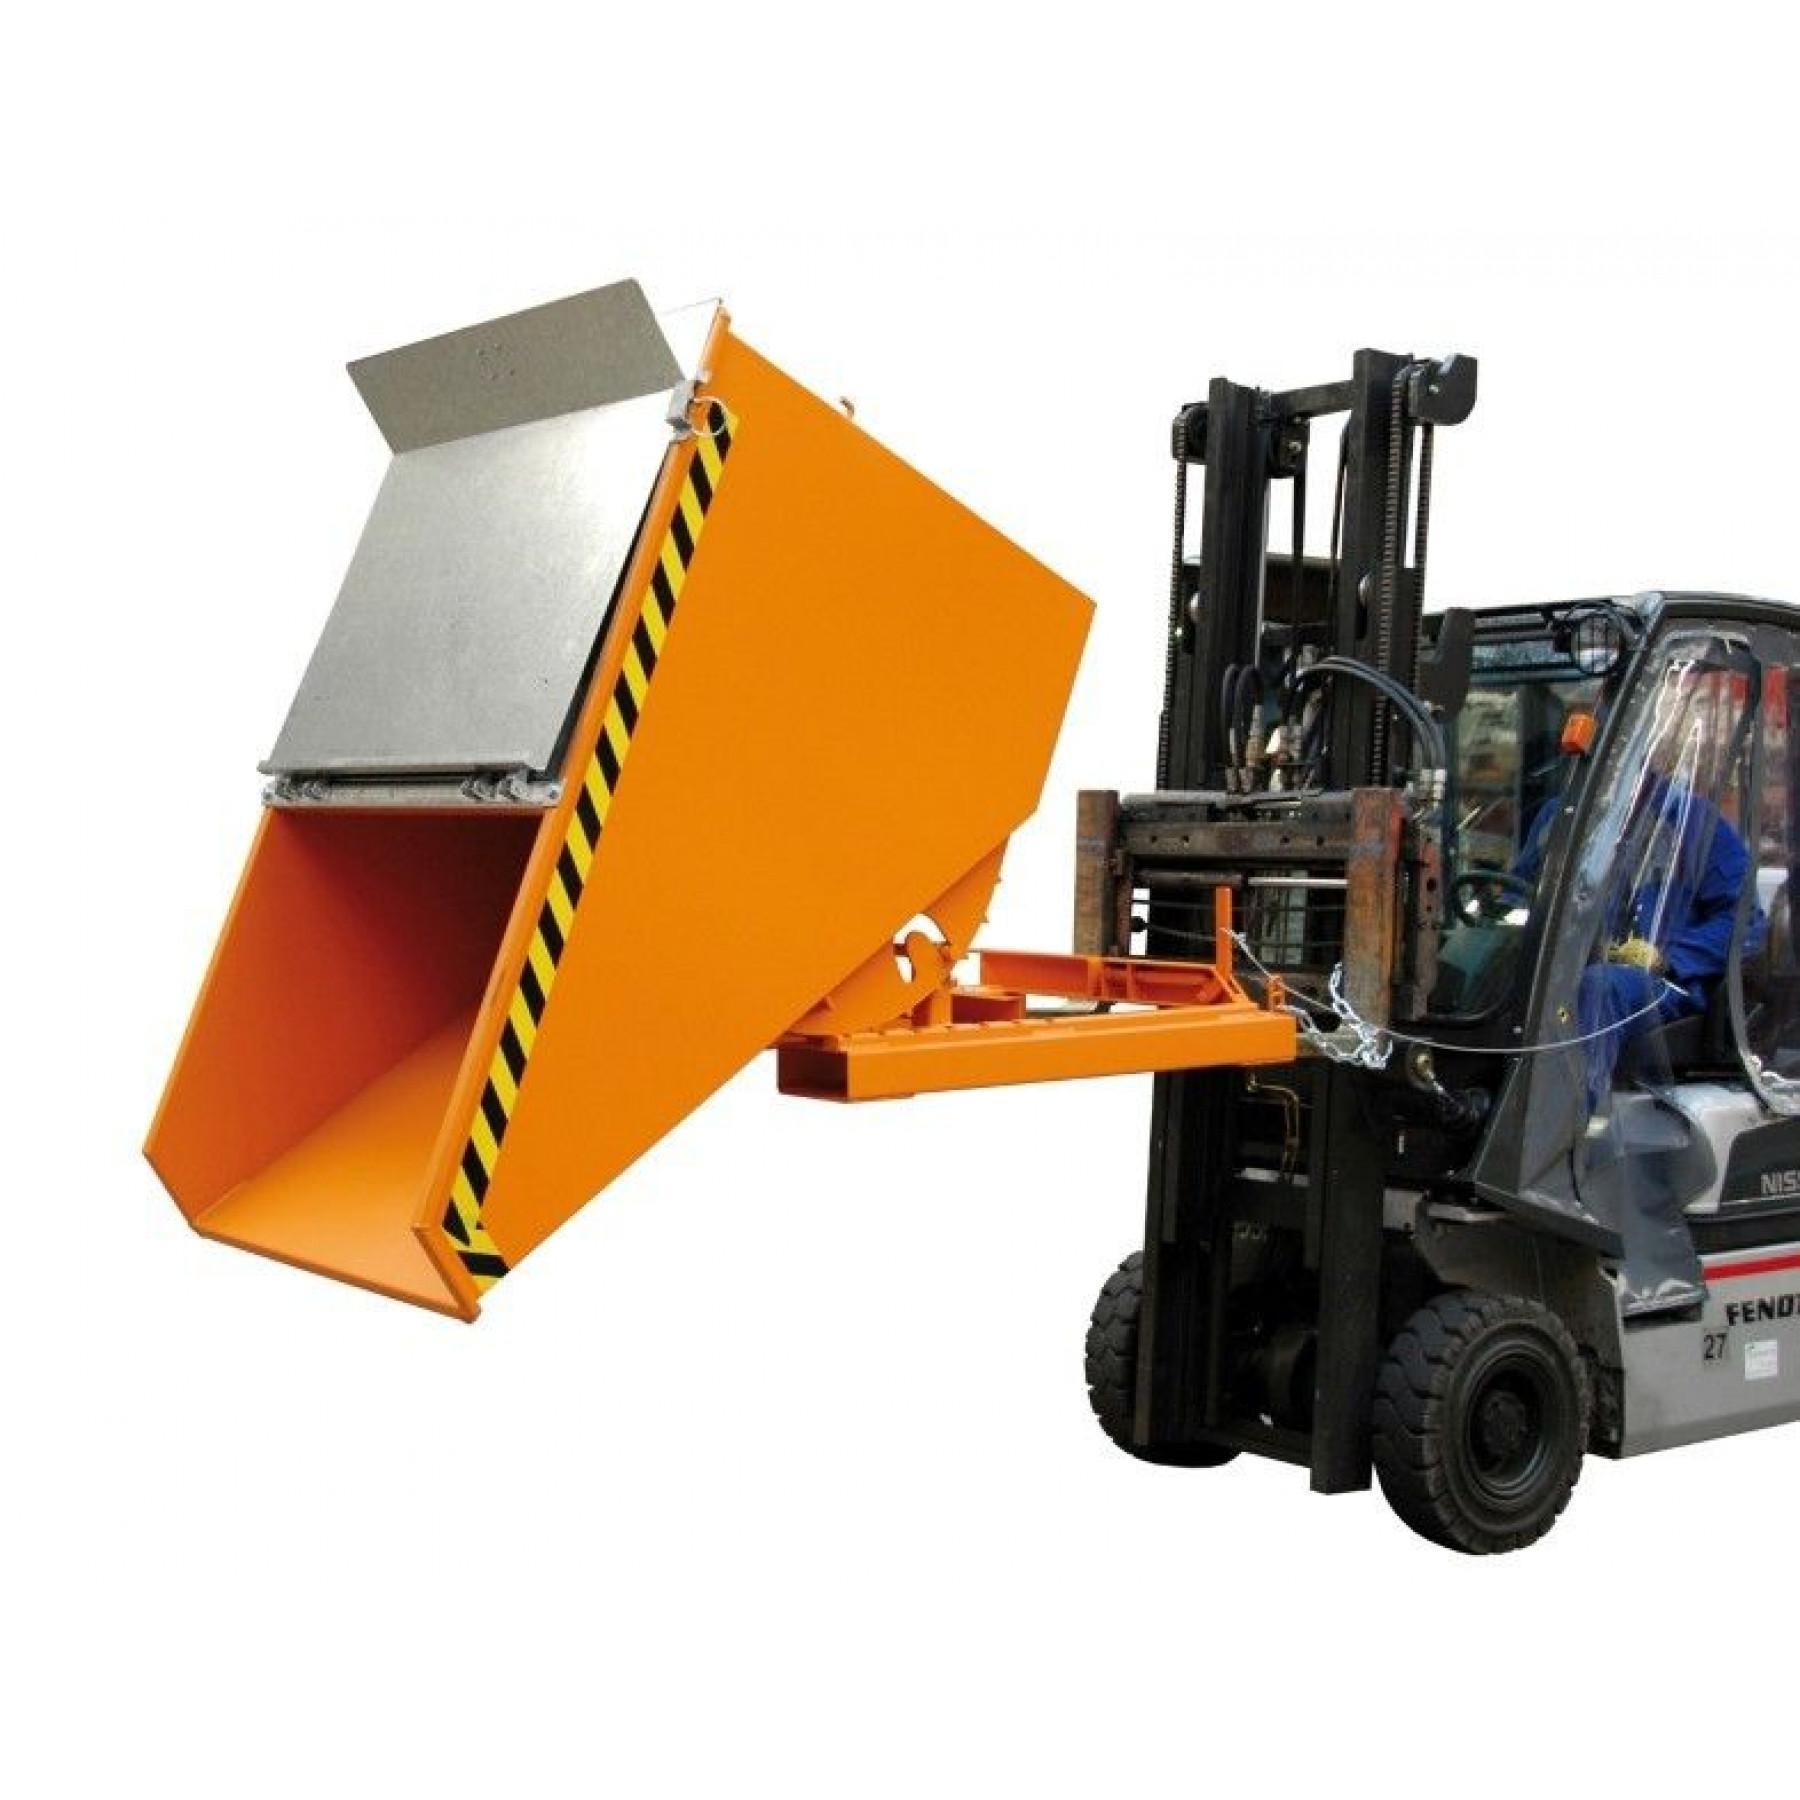 Verzinkt deksel t.b.v. kiepcontainer 1200 liter, MTF-1200-DEKSEL